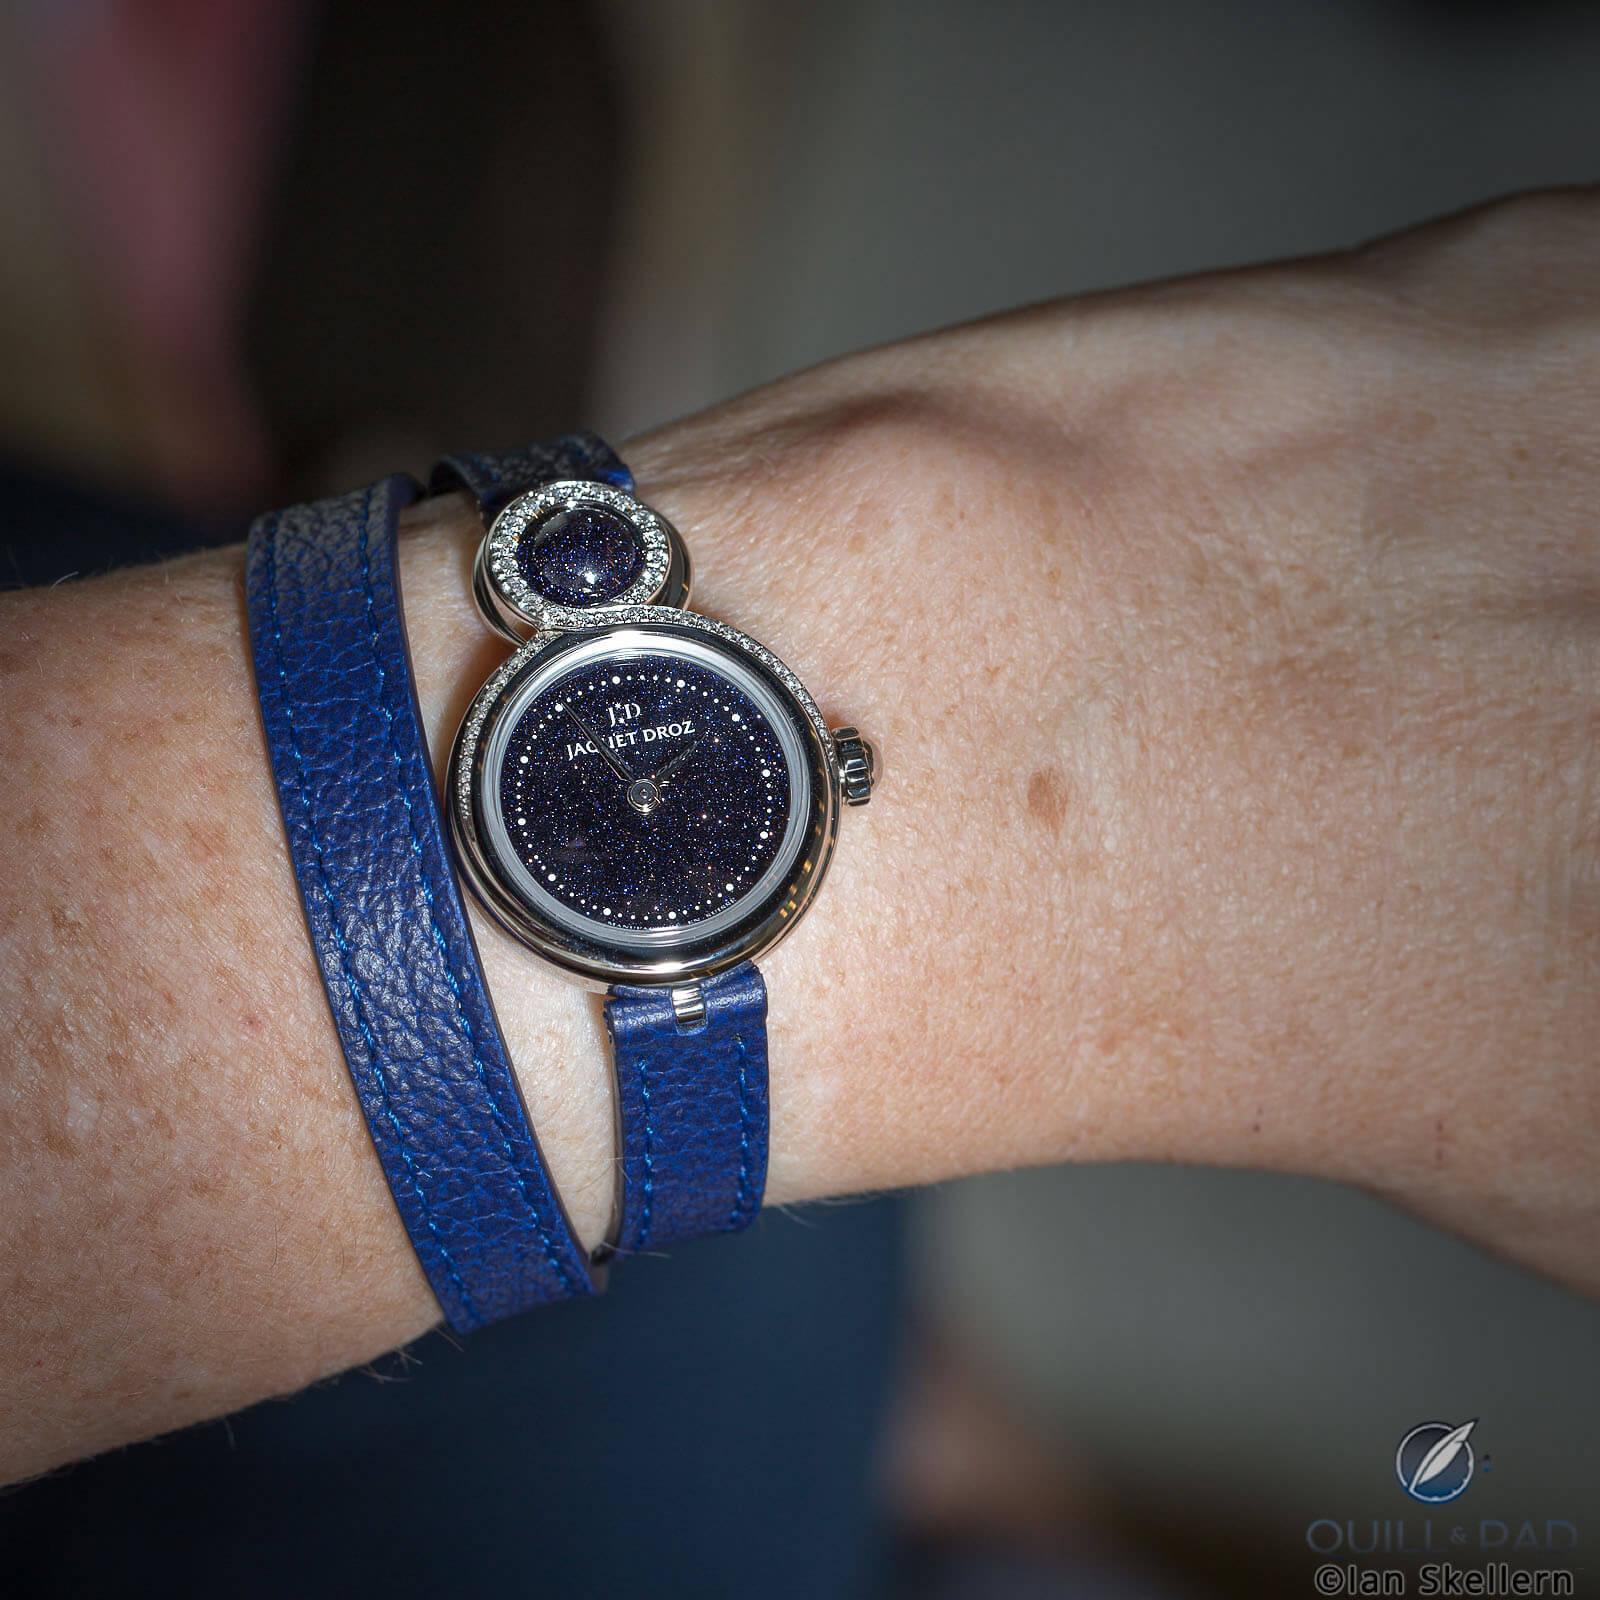 Jaquet Droz Lady 8 Petite Aventurine on the wrist